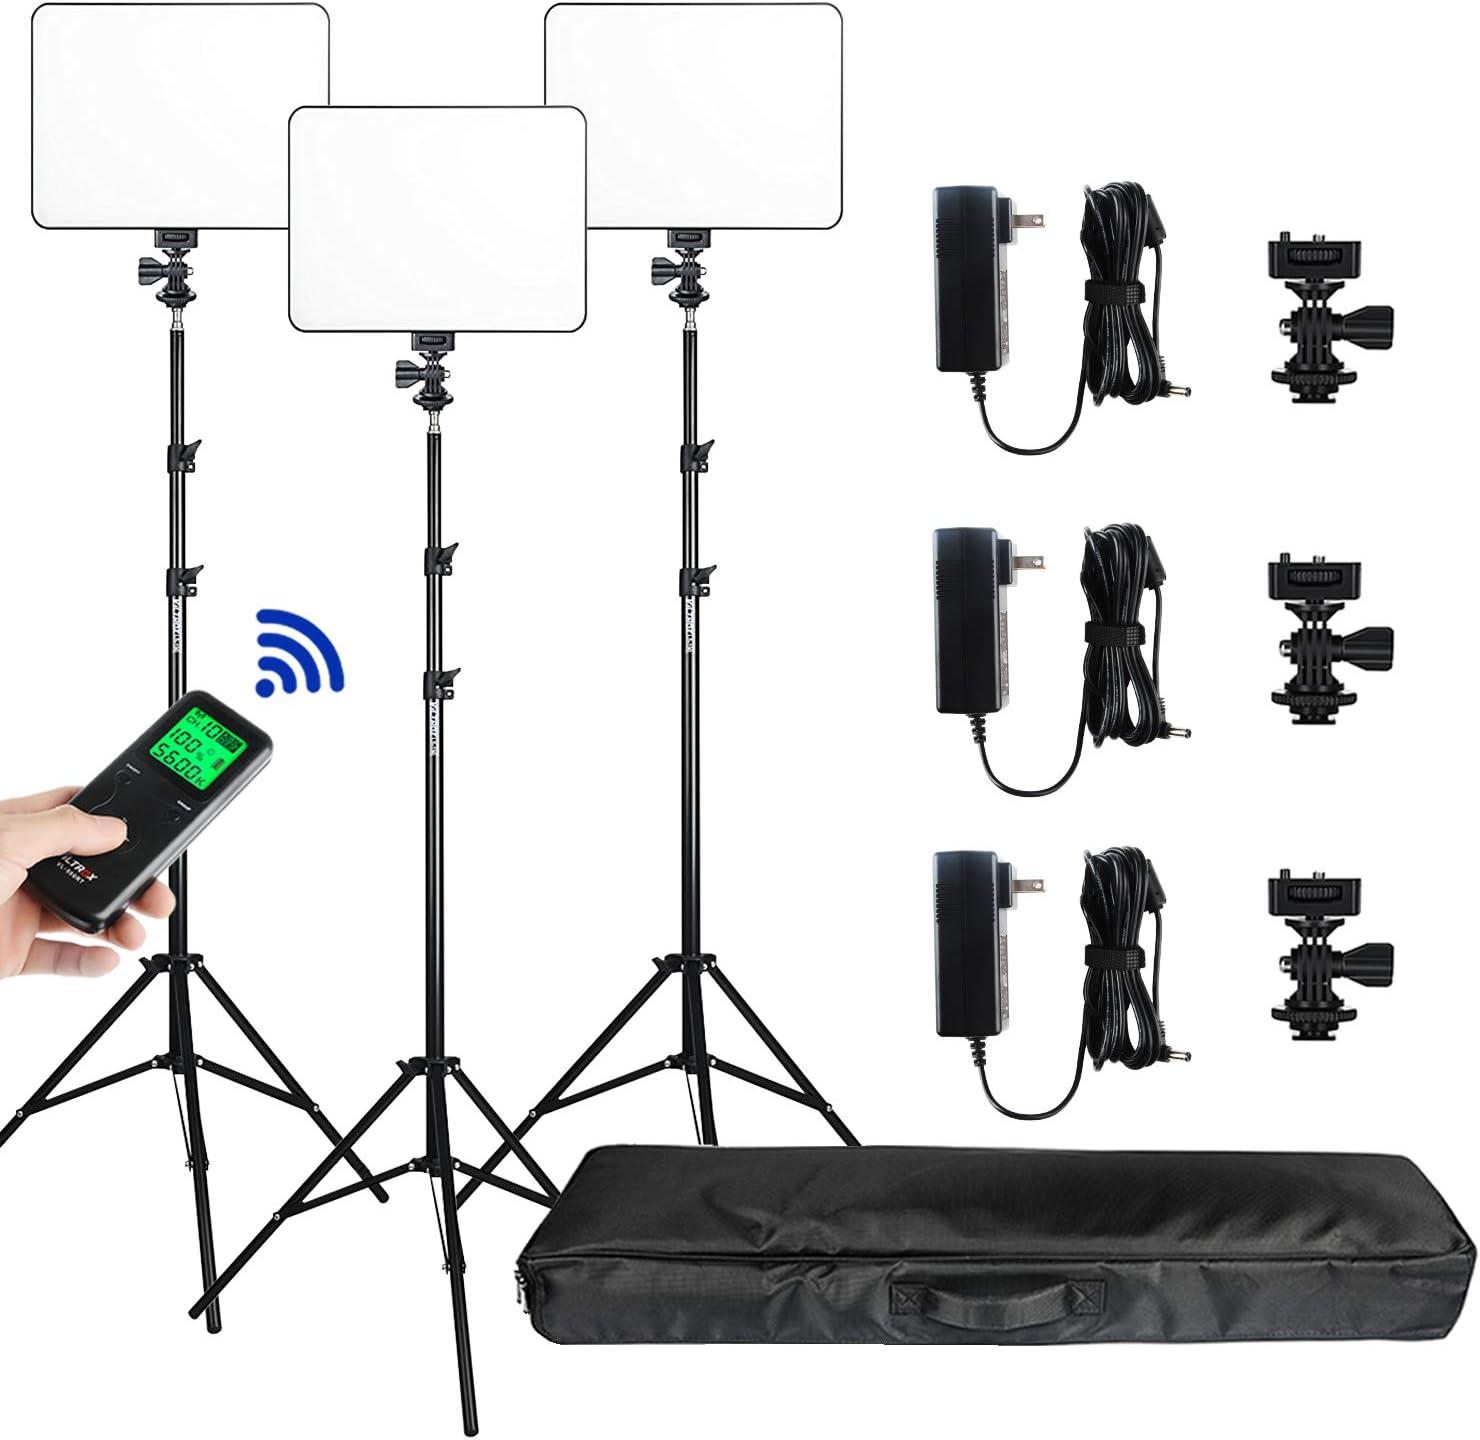 (3 Packs) VILTROX vl-200 Light 30W Bi-Color 3300K-5600K Studio Lights Kit with Stand,CRI 95+ Wide Angel LED Photography Lighting for Video Shooting